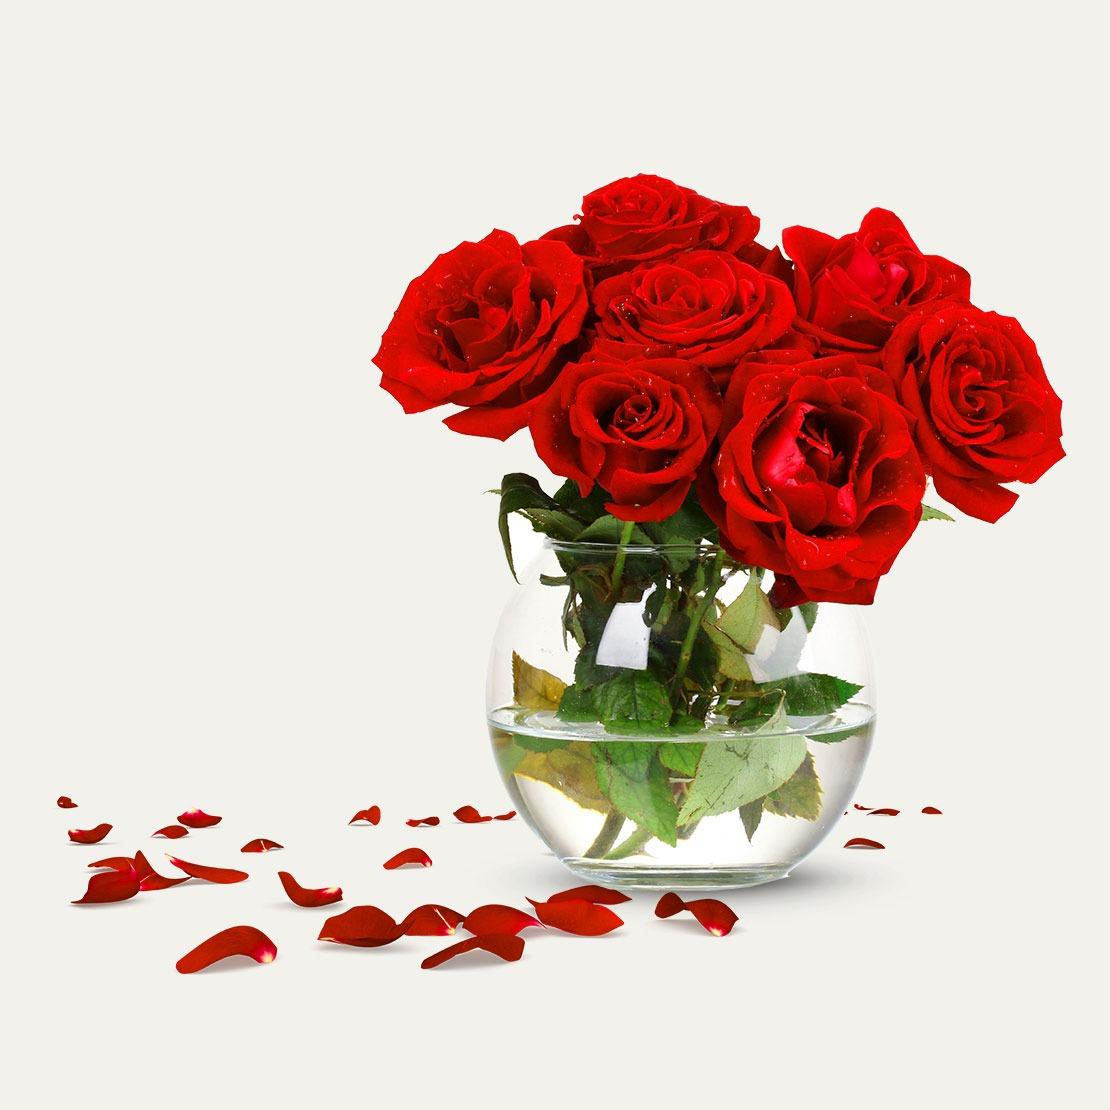 Rose Whatsapp DP Wallpaper Download